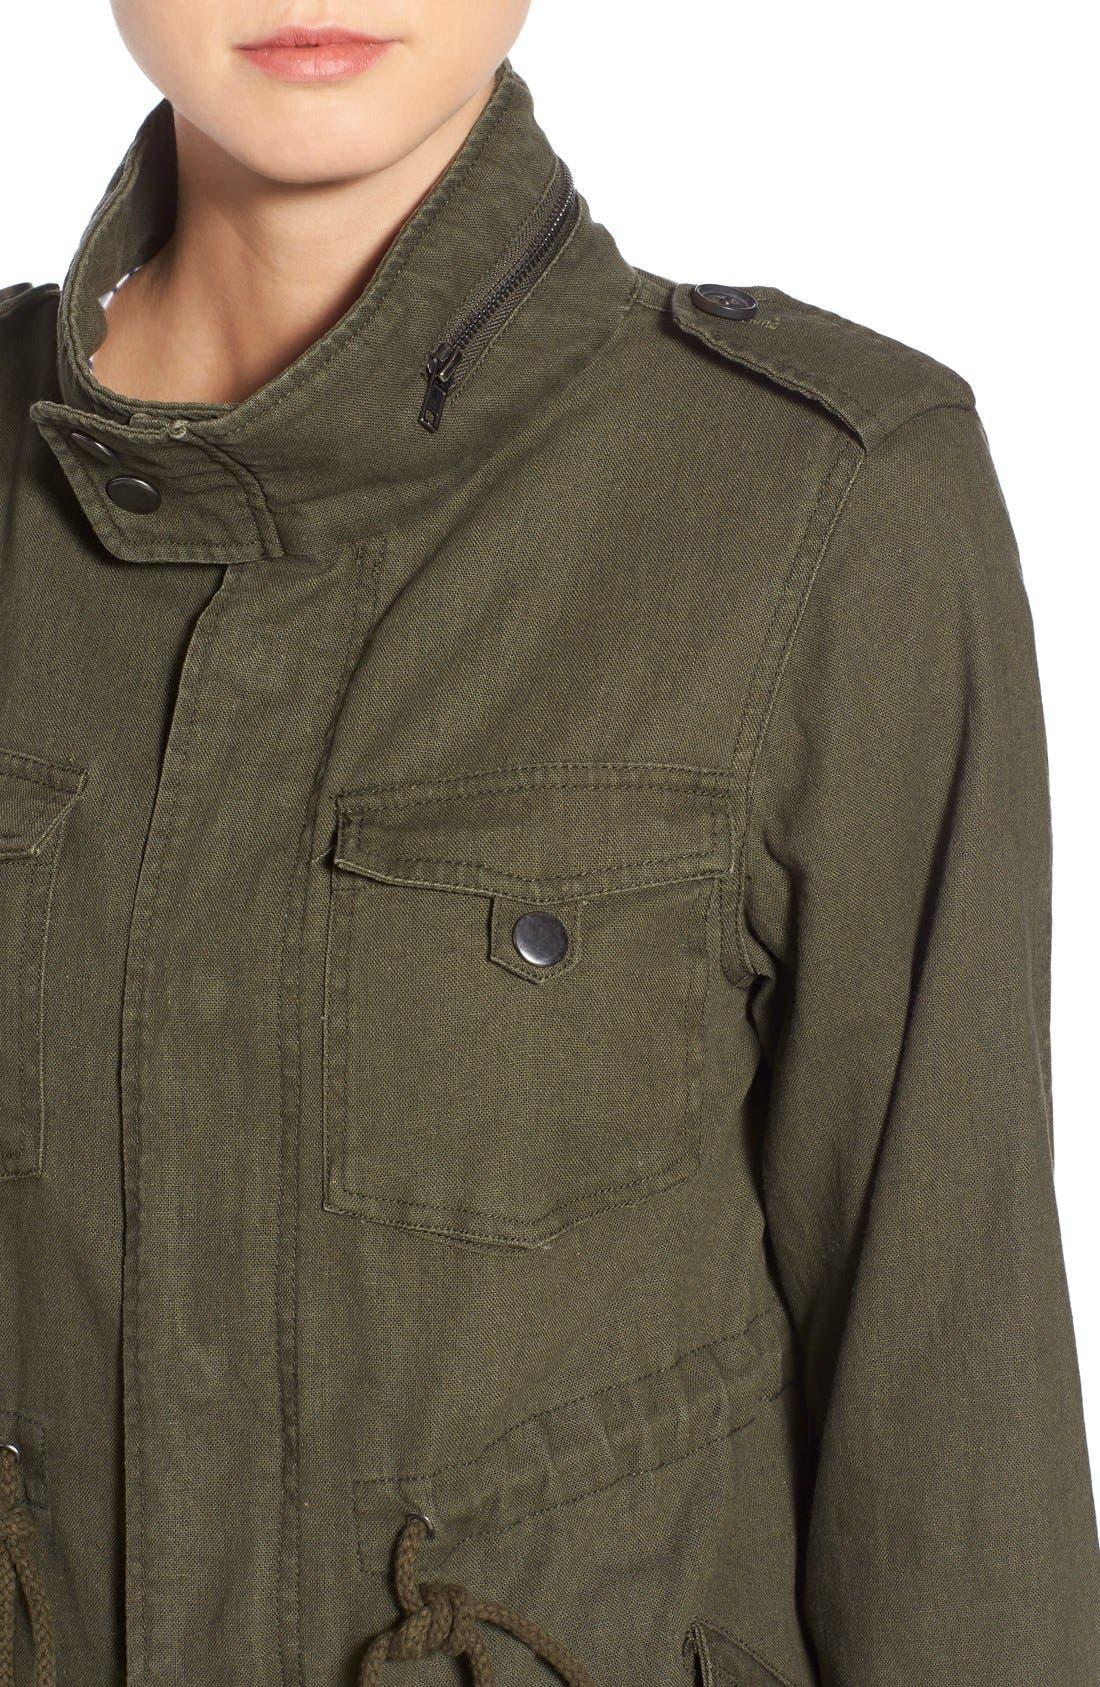 Alternate Image 4  - Pleione Linen & Cotton Blend Military Jacket (Regular & Petite)